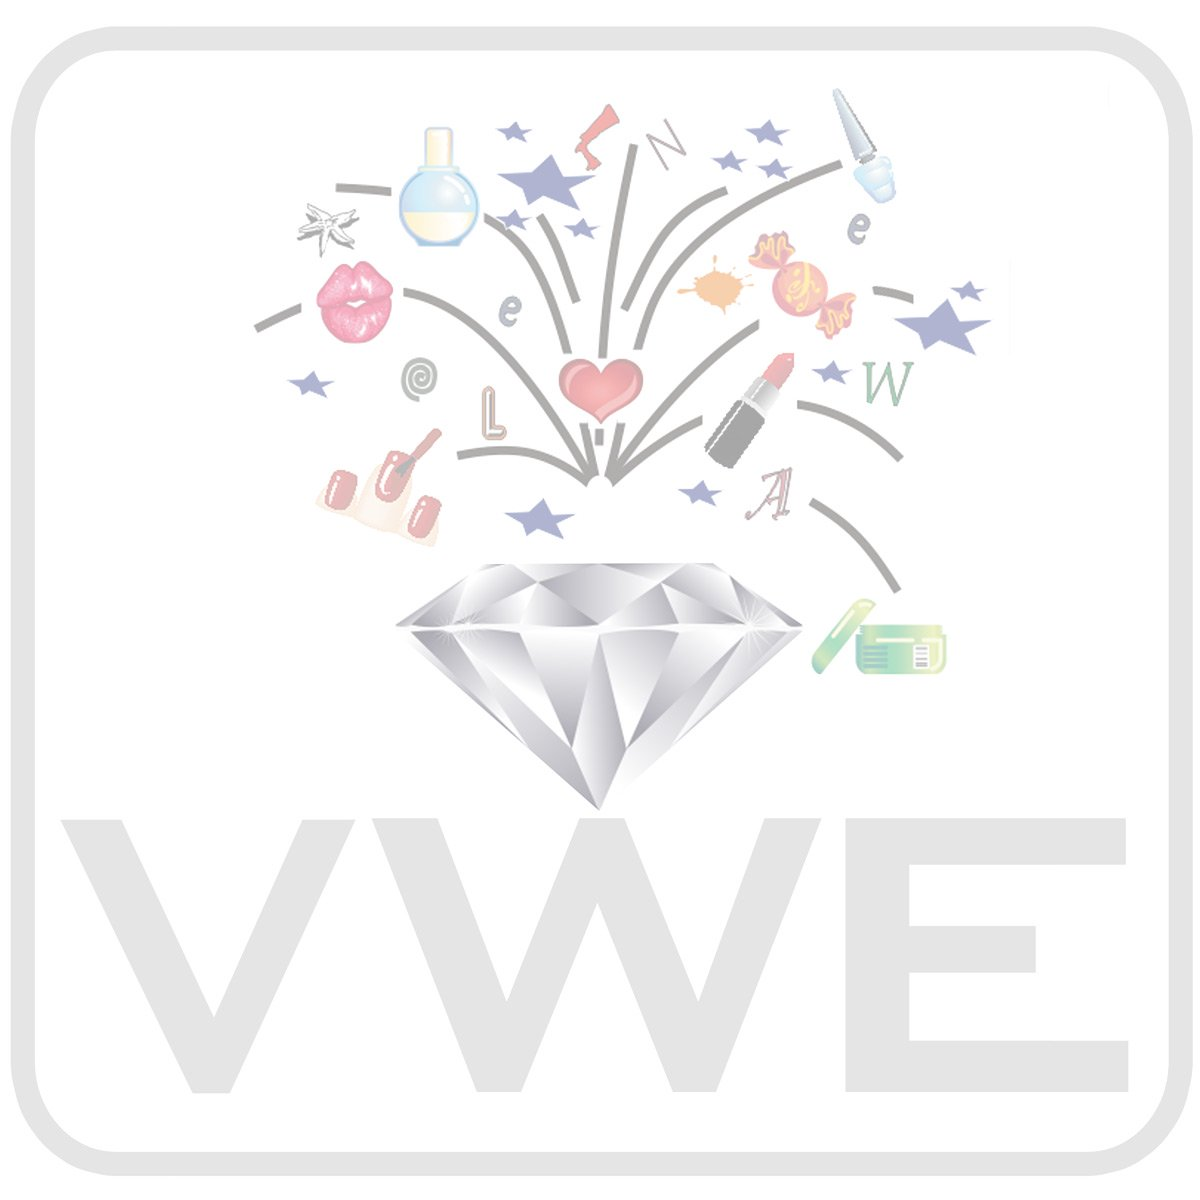 UV Gel Crystal Crush, 5ml  [9 / 10]